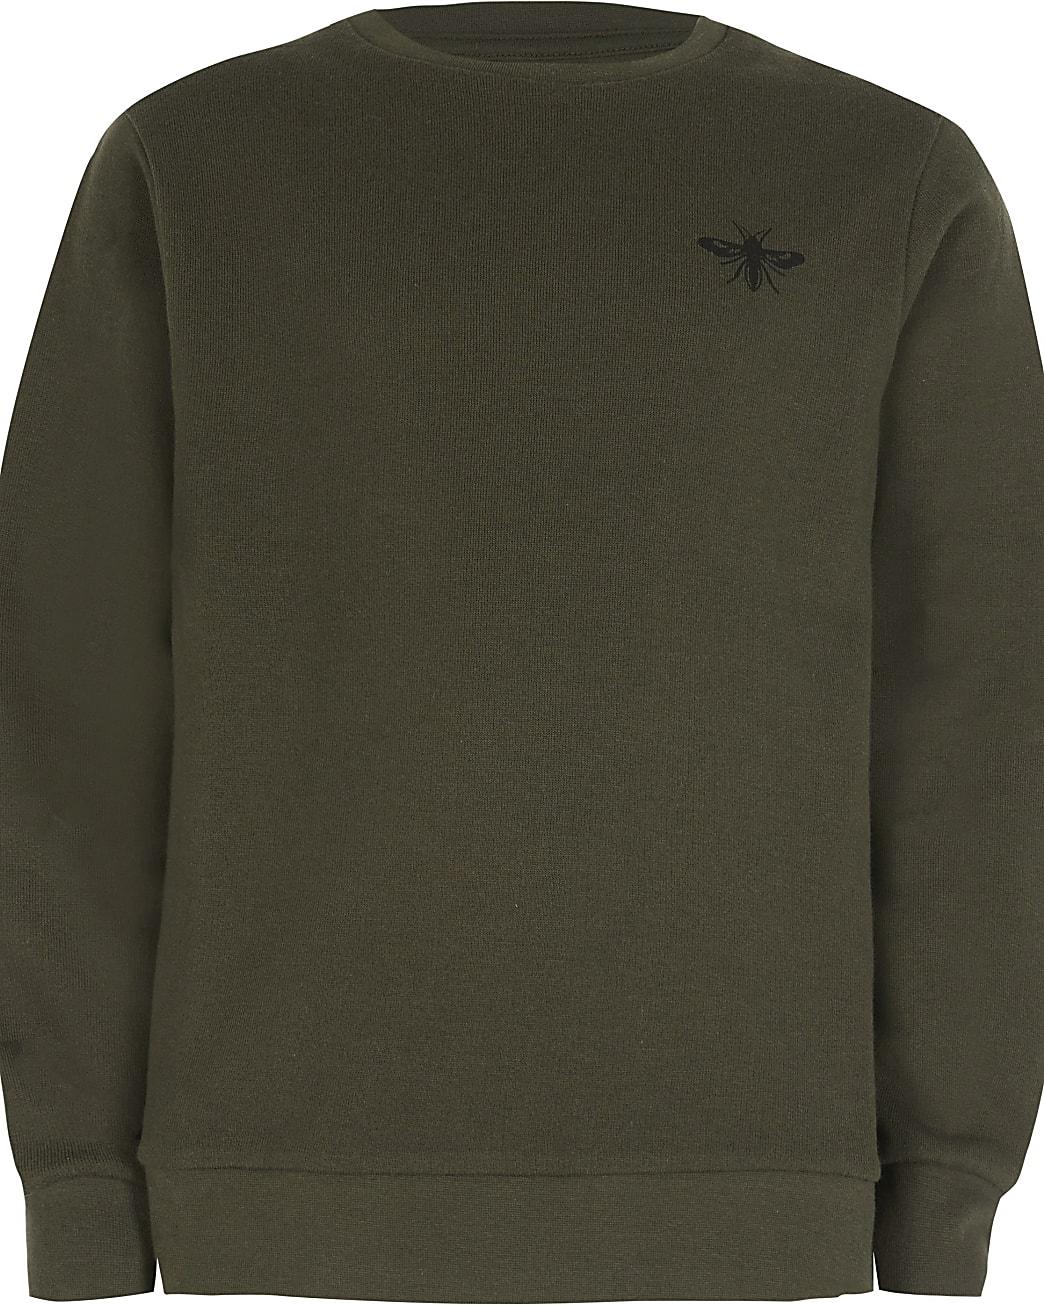 Age 13+ boys khaki wasp sweatshirt